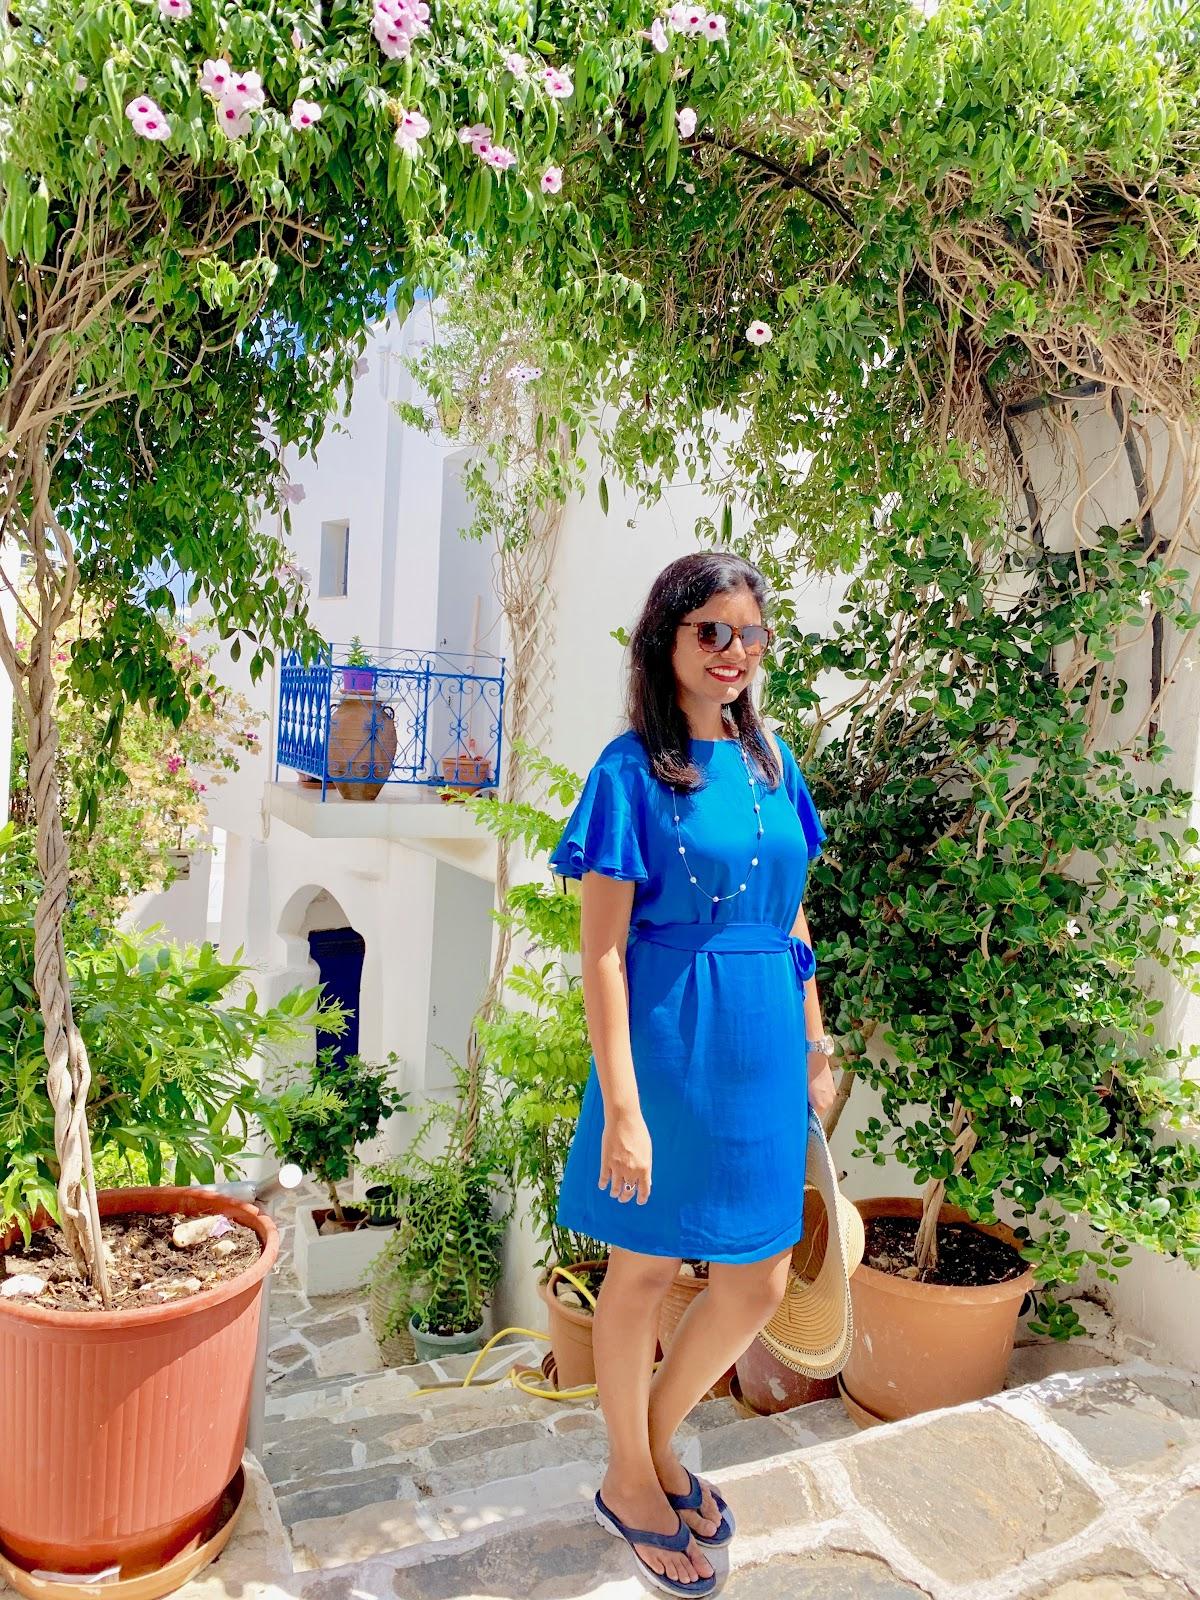 Lefkes Paros - 2 day itinerary; 2 days in Paros